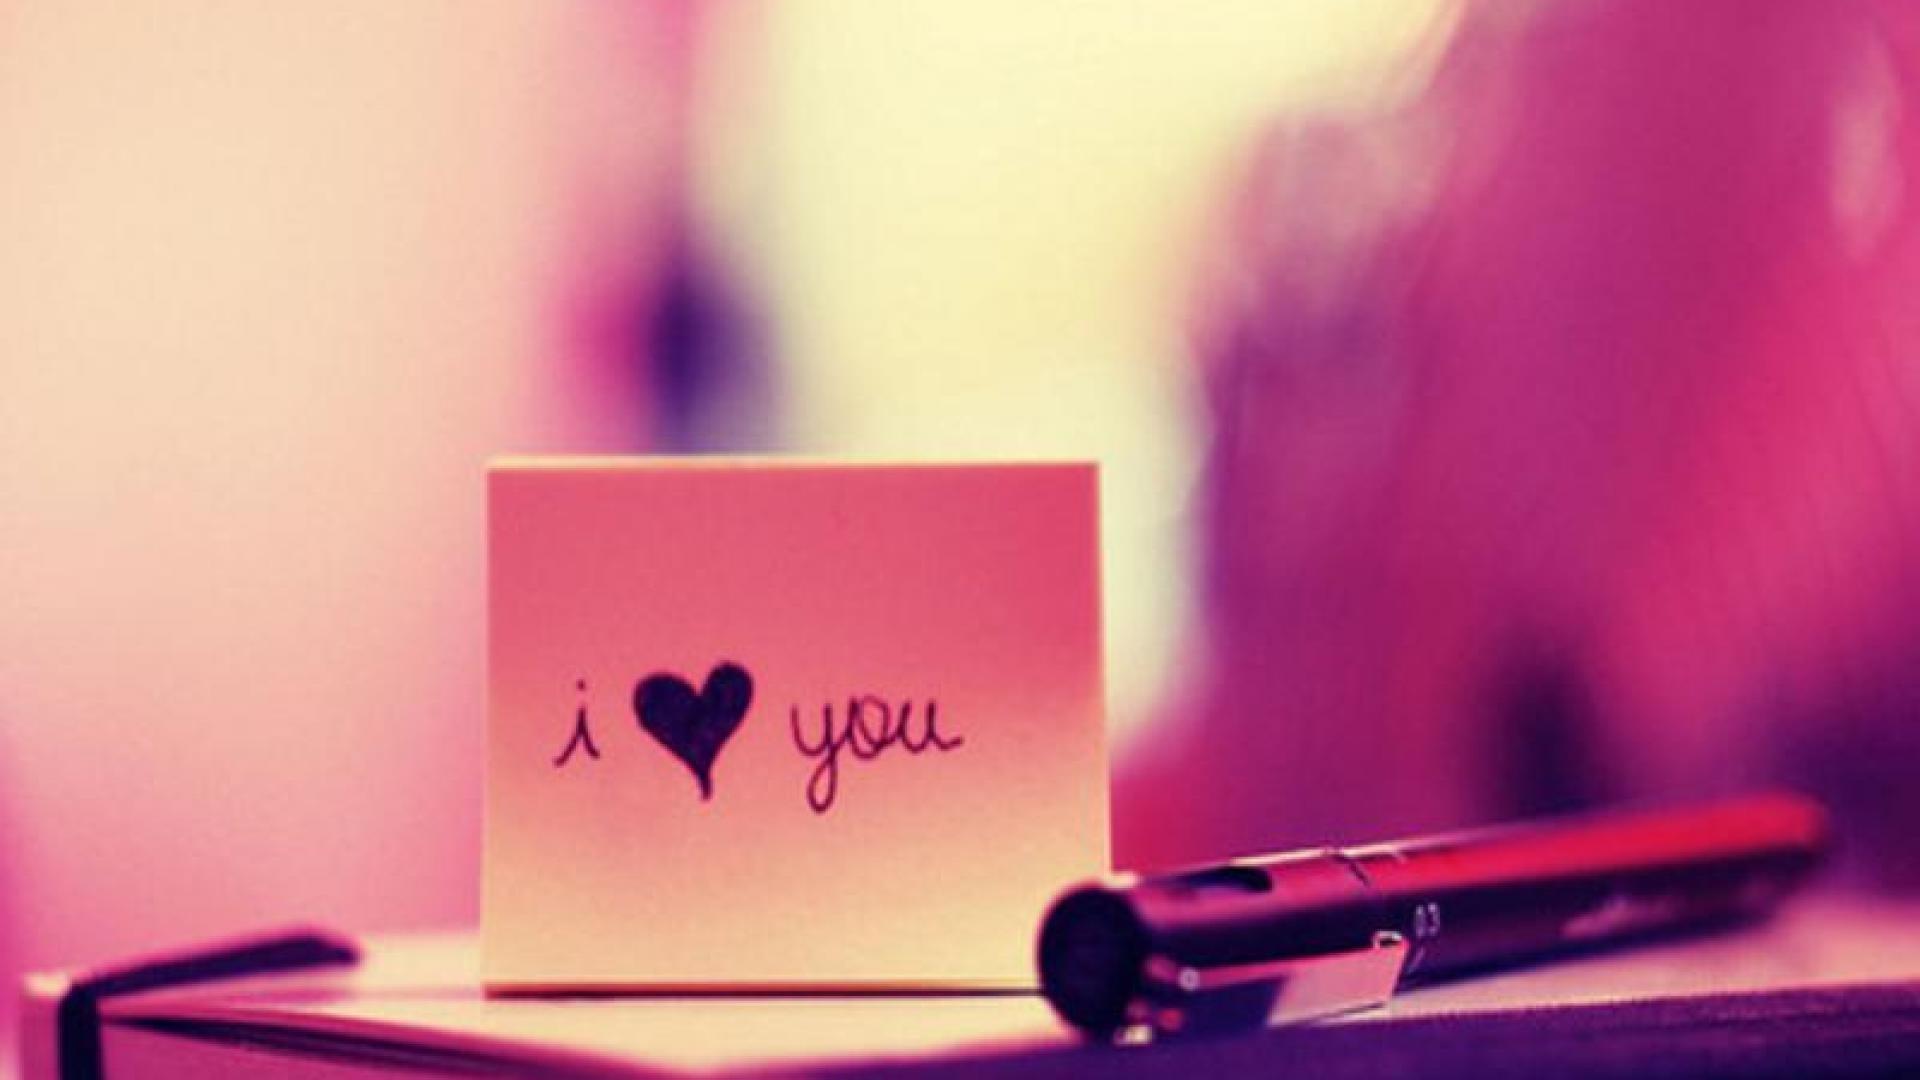 Full Hd Cute Romantic Love Wallpapers For Laptop Cute - Full Hd Cute Love , HD Wallpaper & Backgrounds